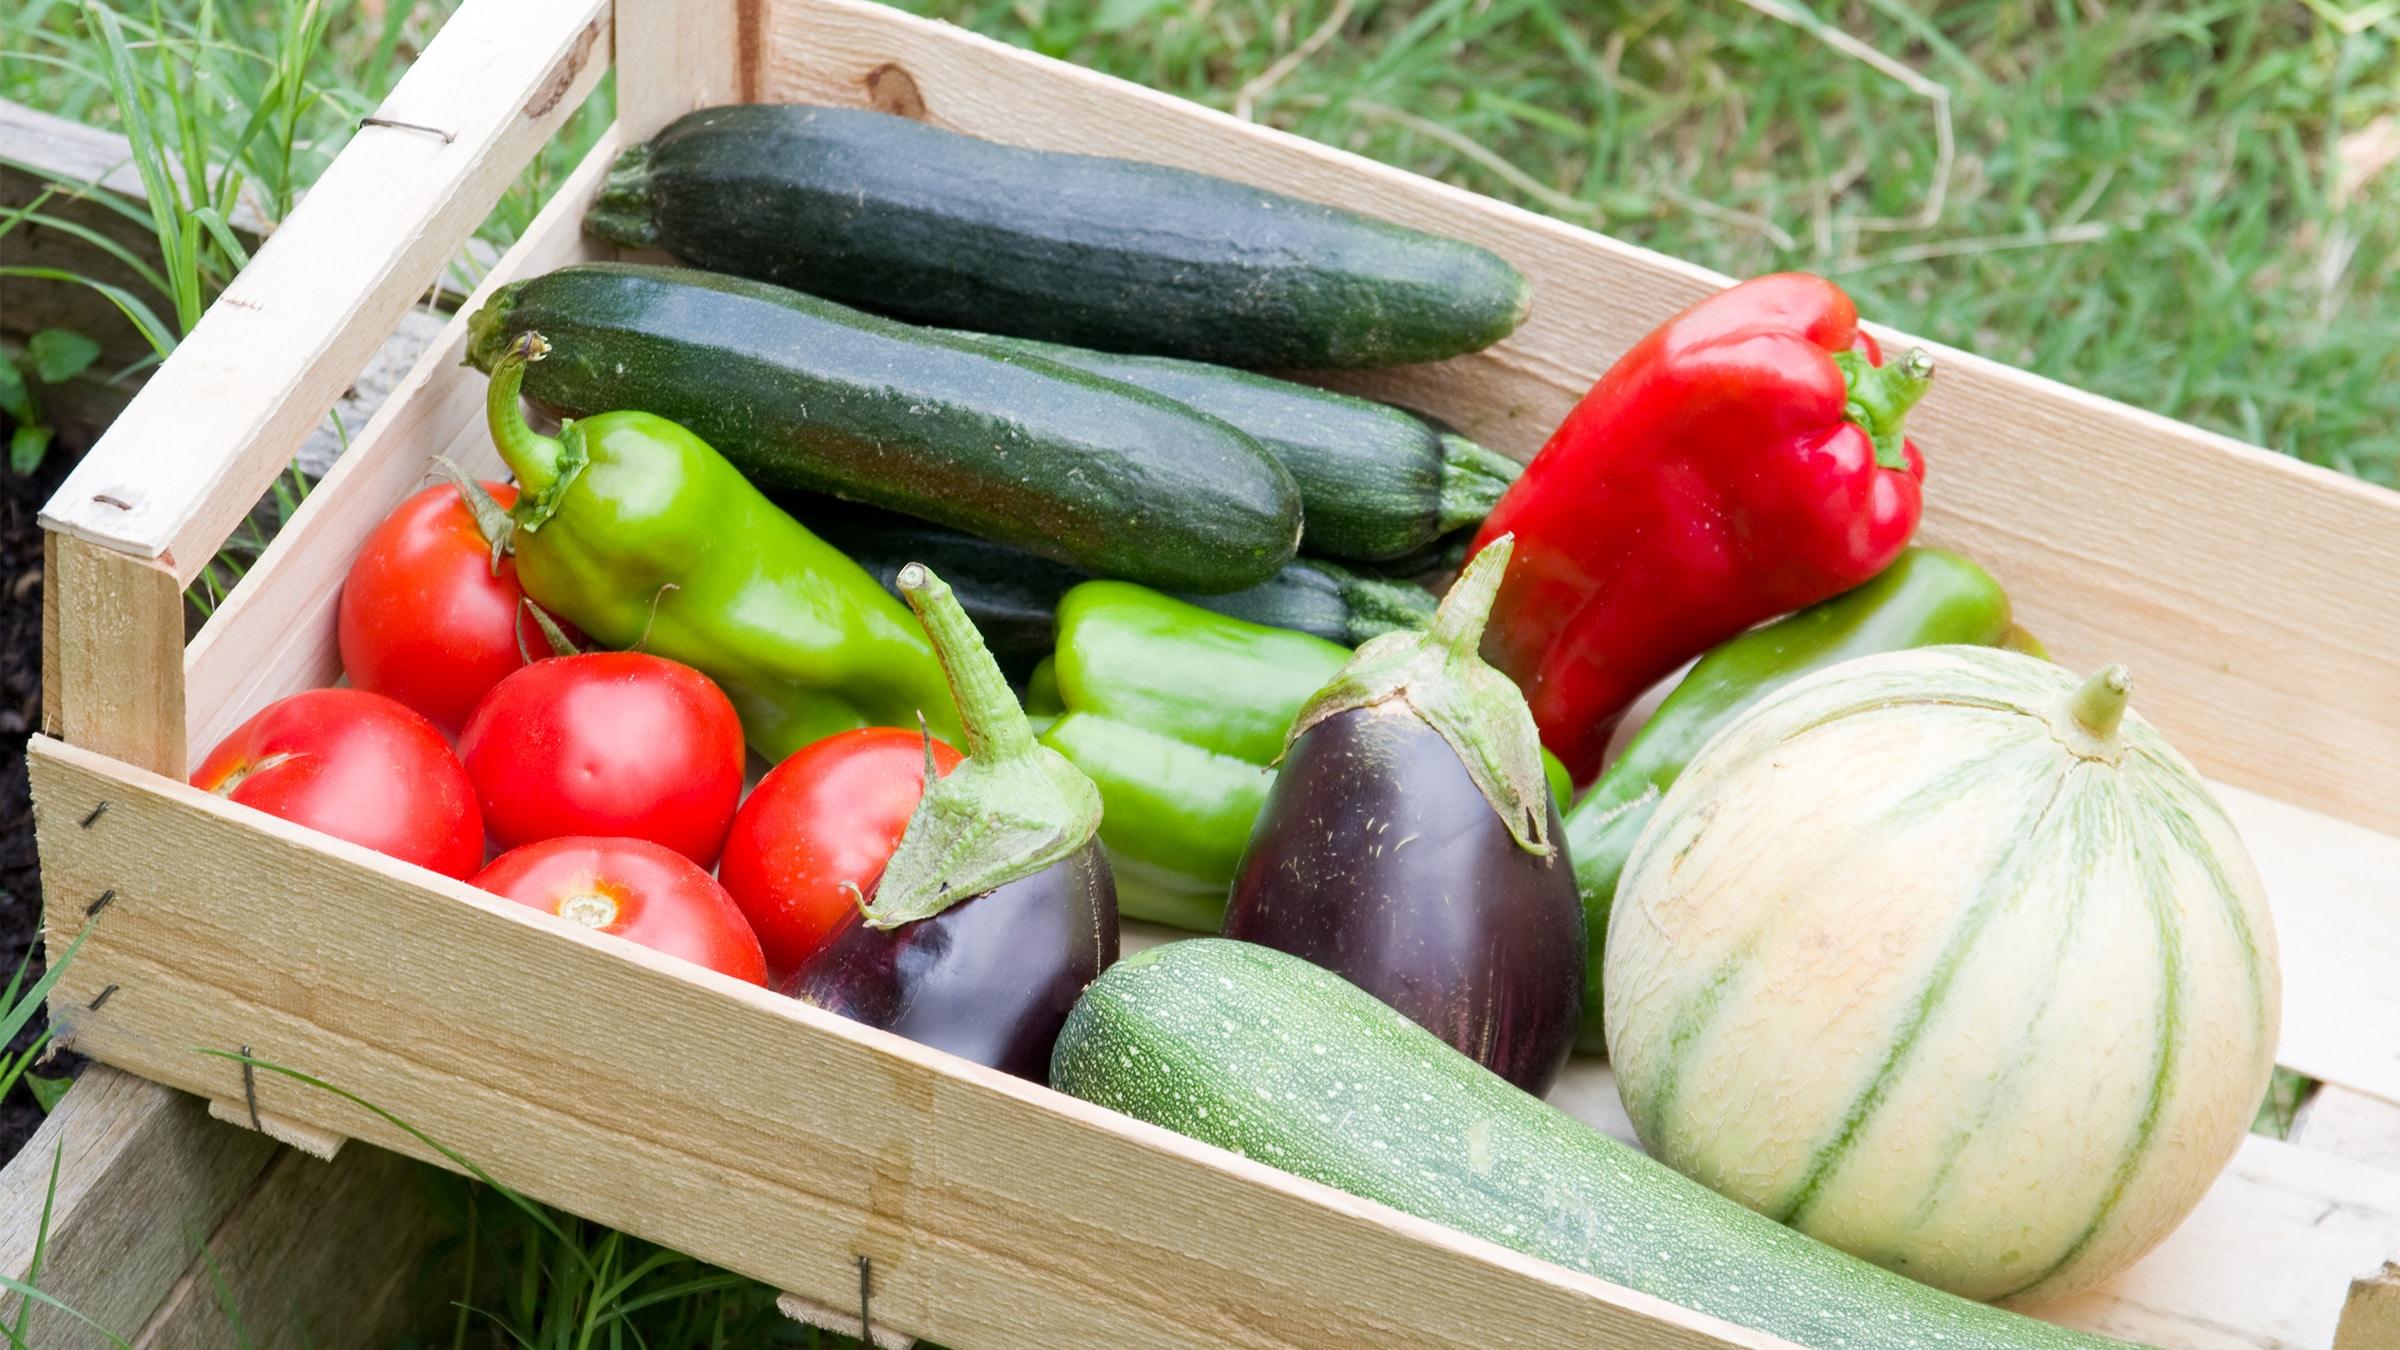 tomaten, gurken, kürbis, paprika